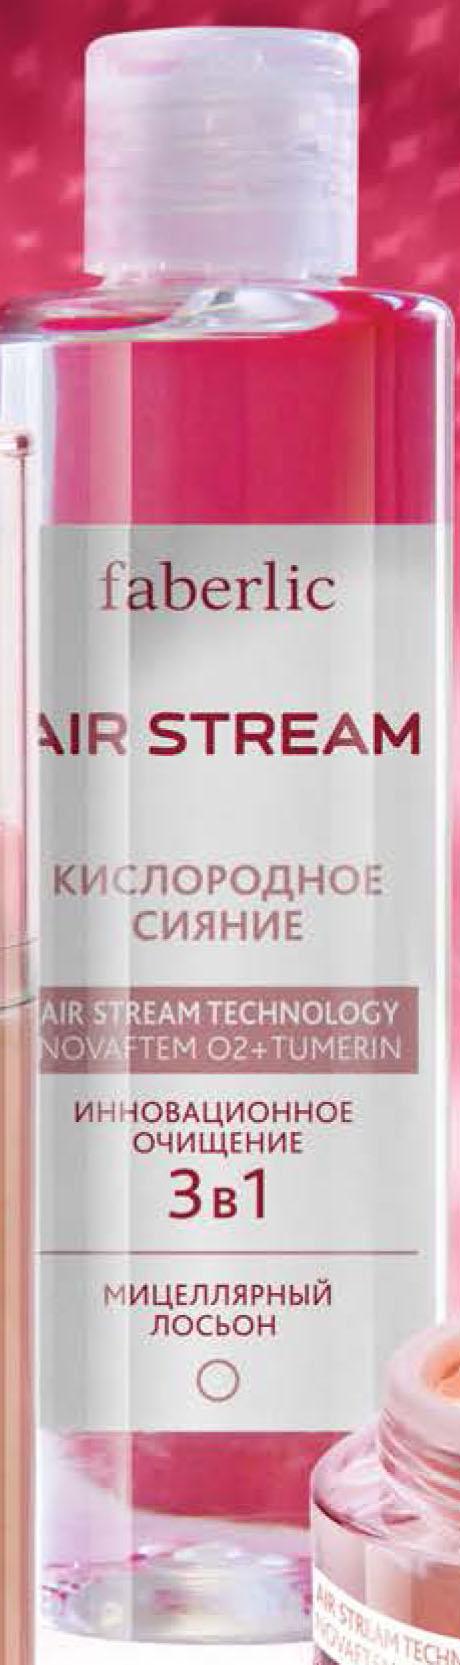 Air stream фаберлик кислородное сияние